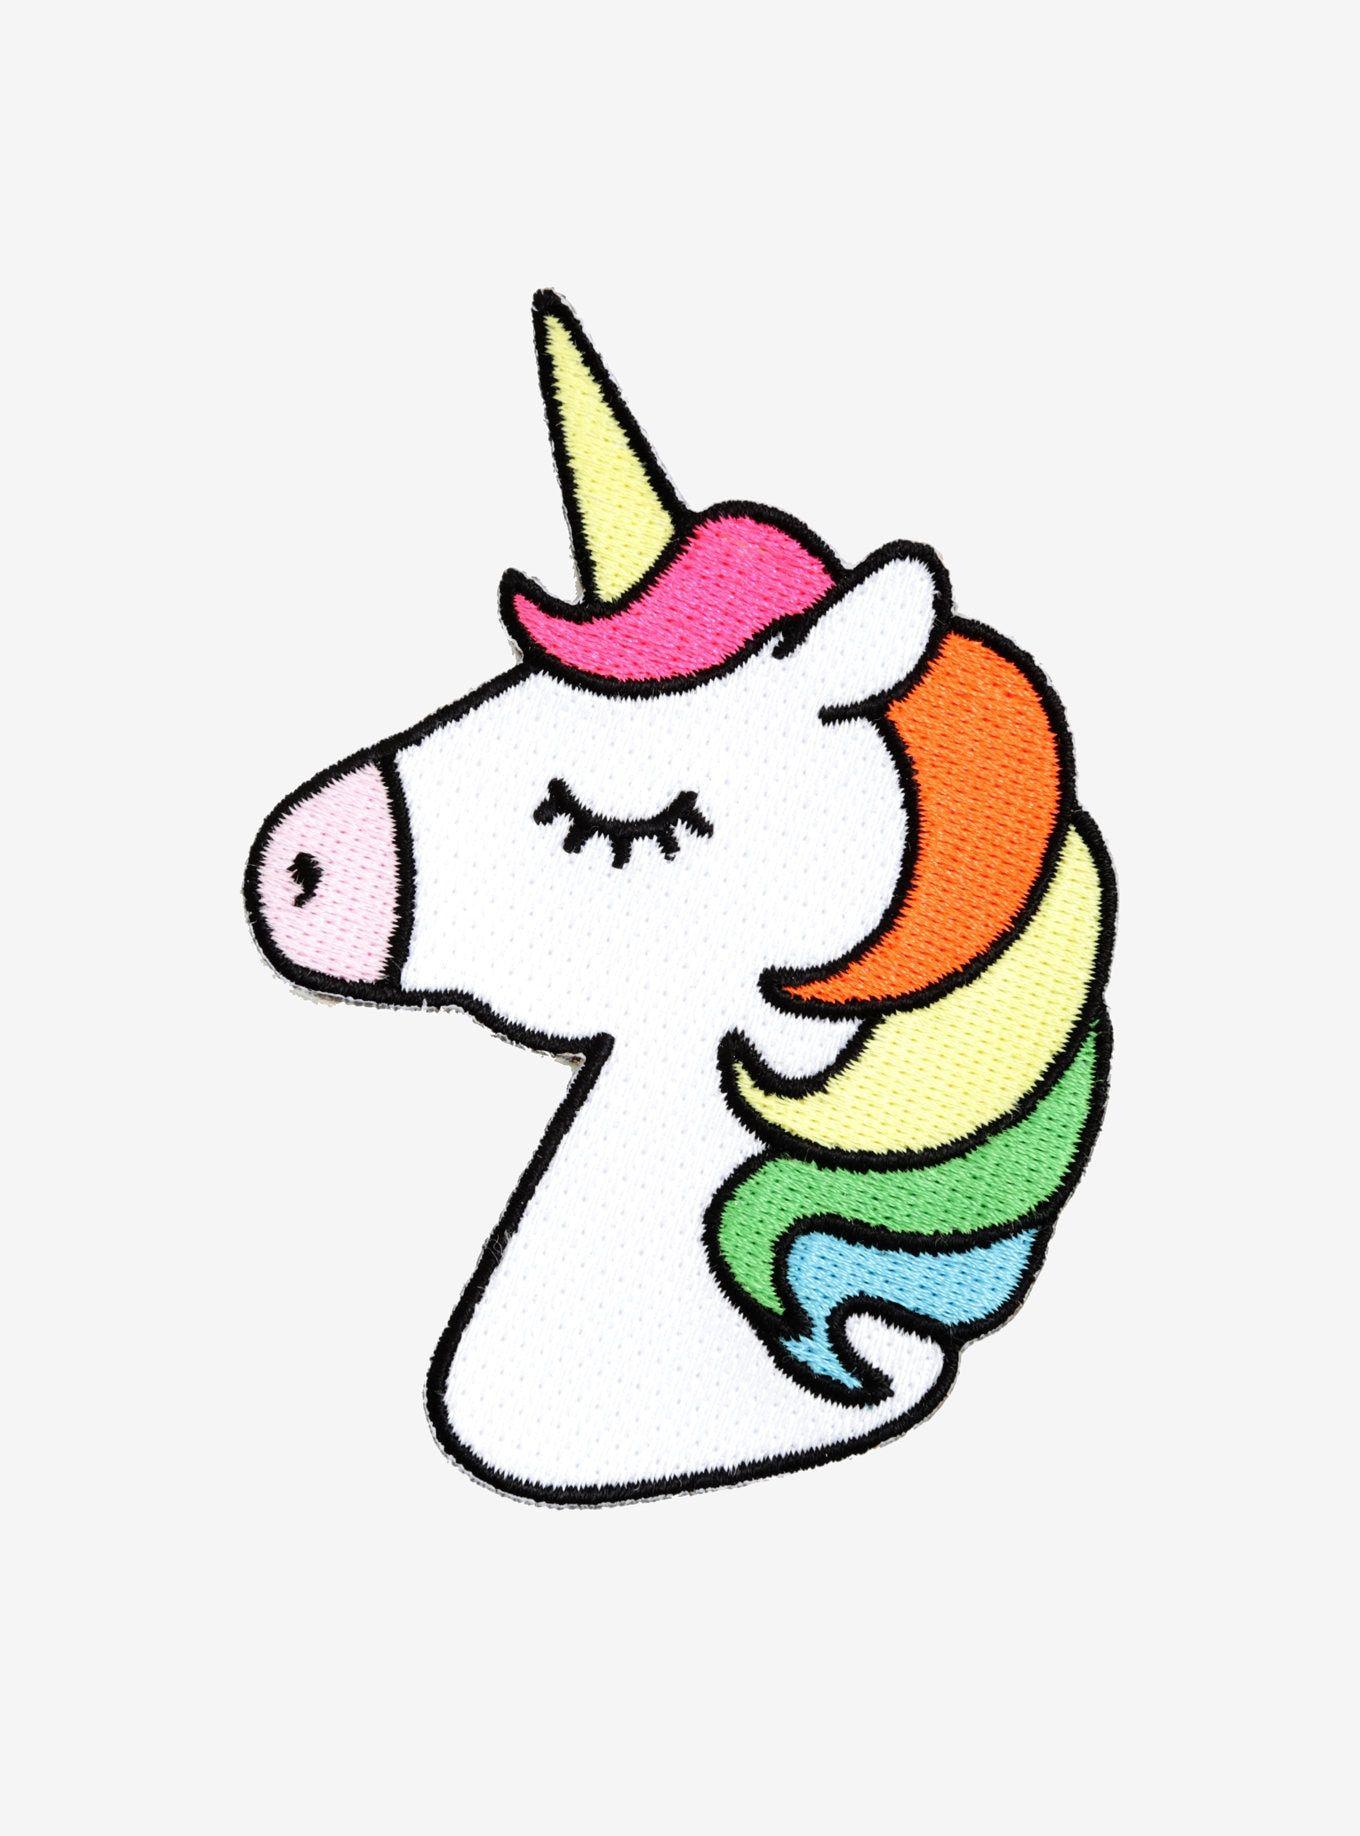 Rainbow Unicorn Patch Dibujos De Unicornios Unicornio Bordado